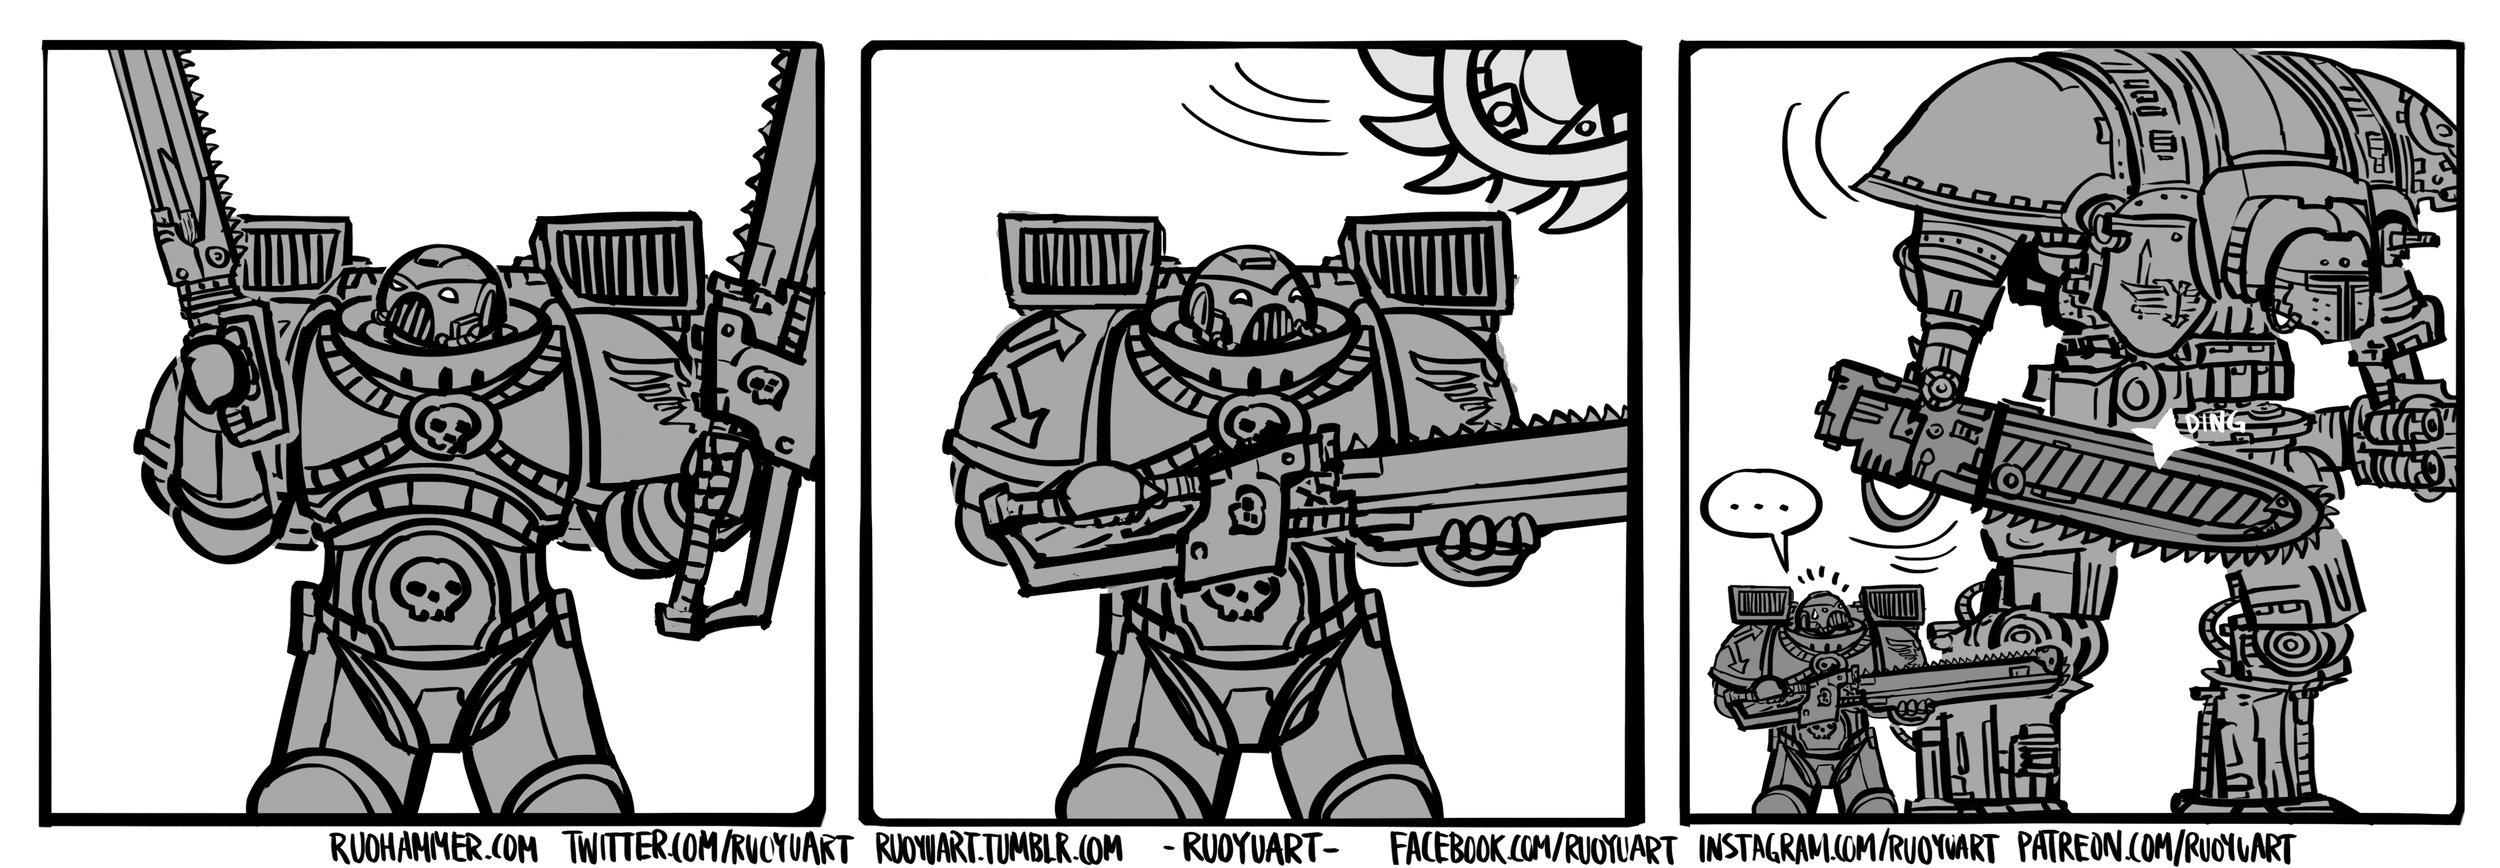 Sword Envy.jpg